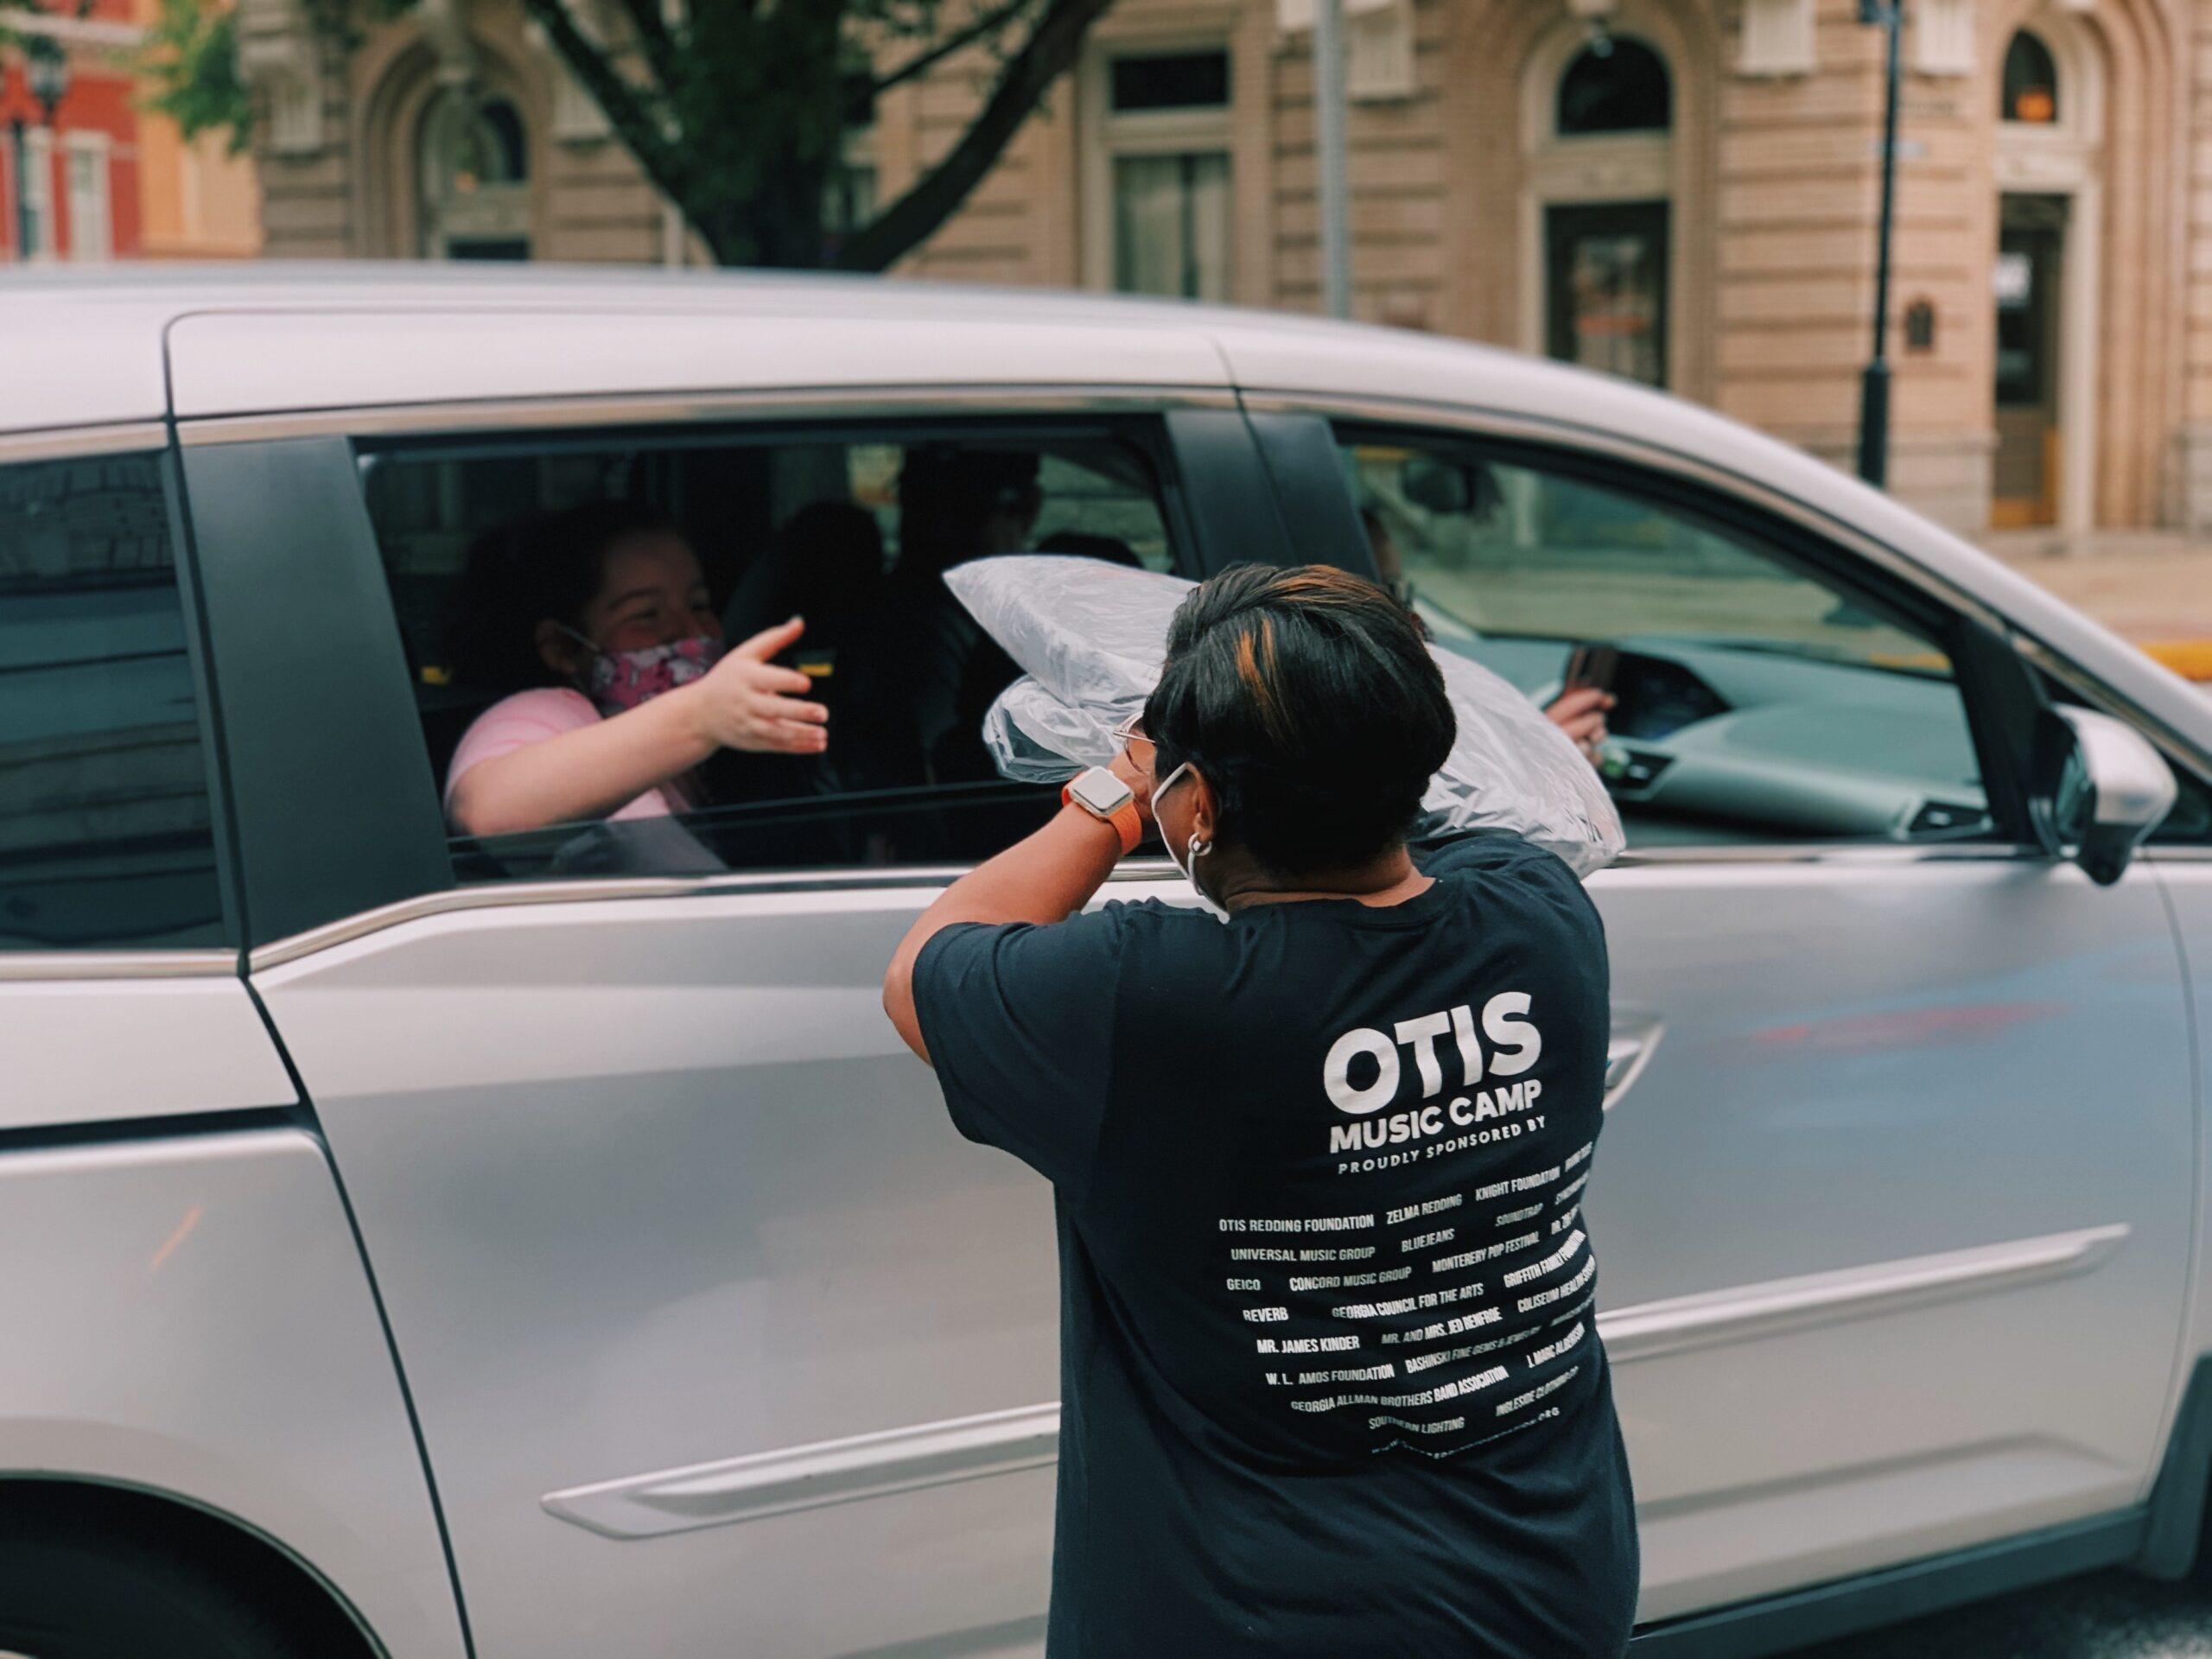 Otis Redding Foundation VP/executive director Karla Redding-Andrews hands an OMC 2.0 gift bag to camper Jena Branch.